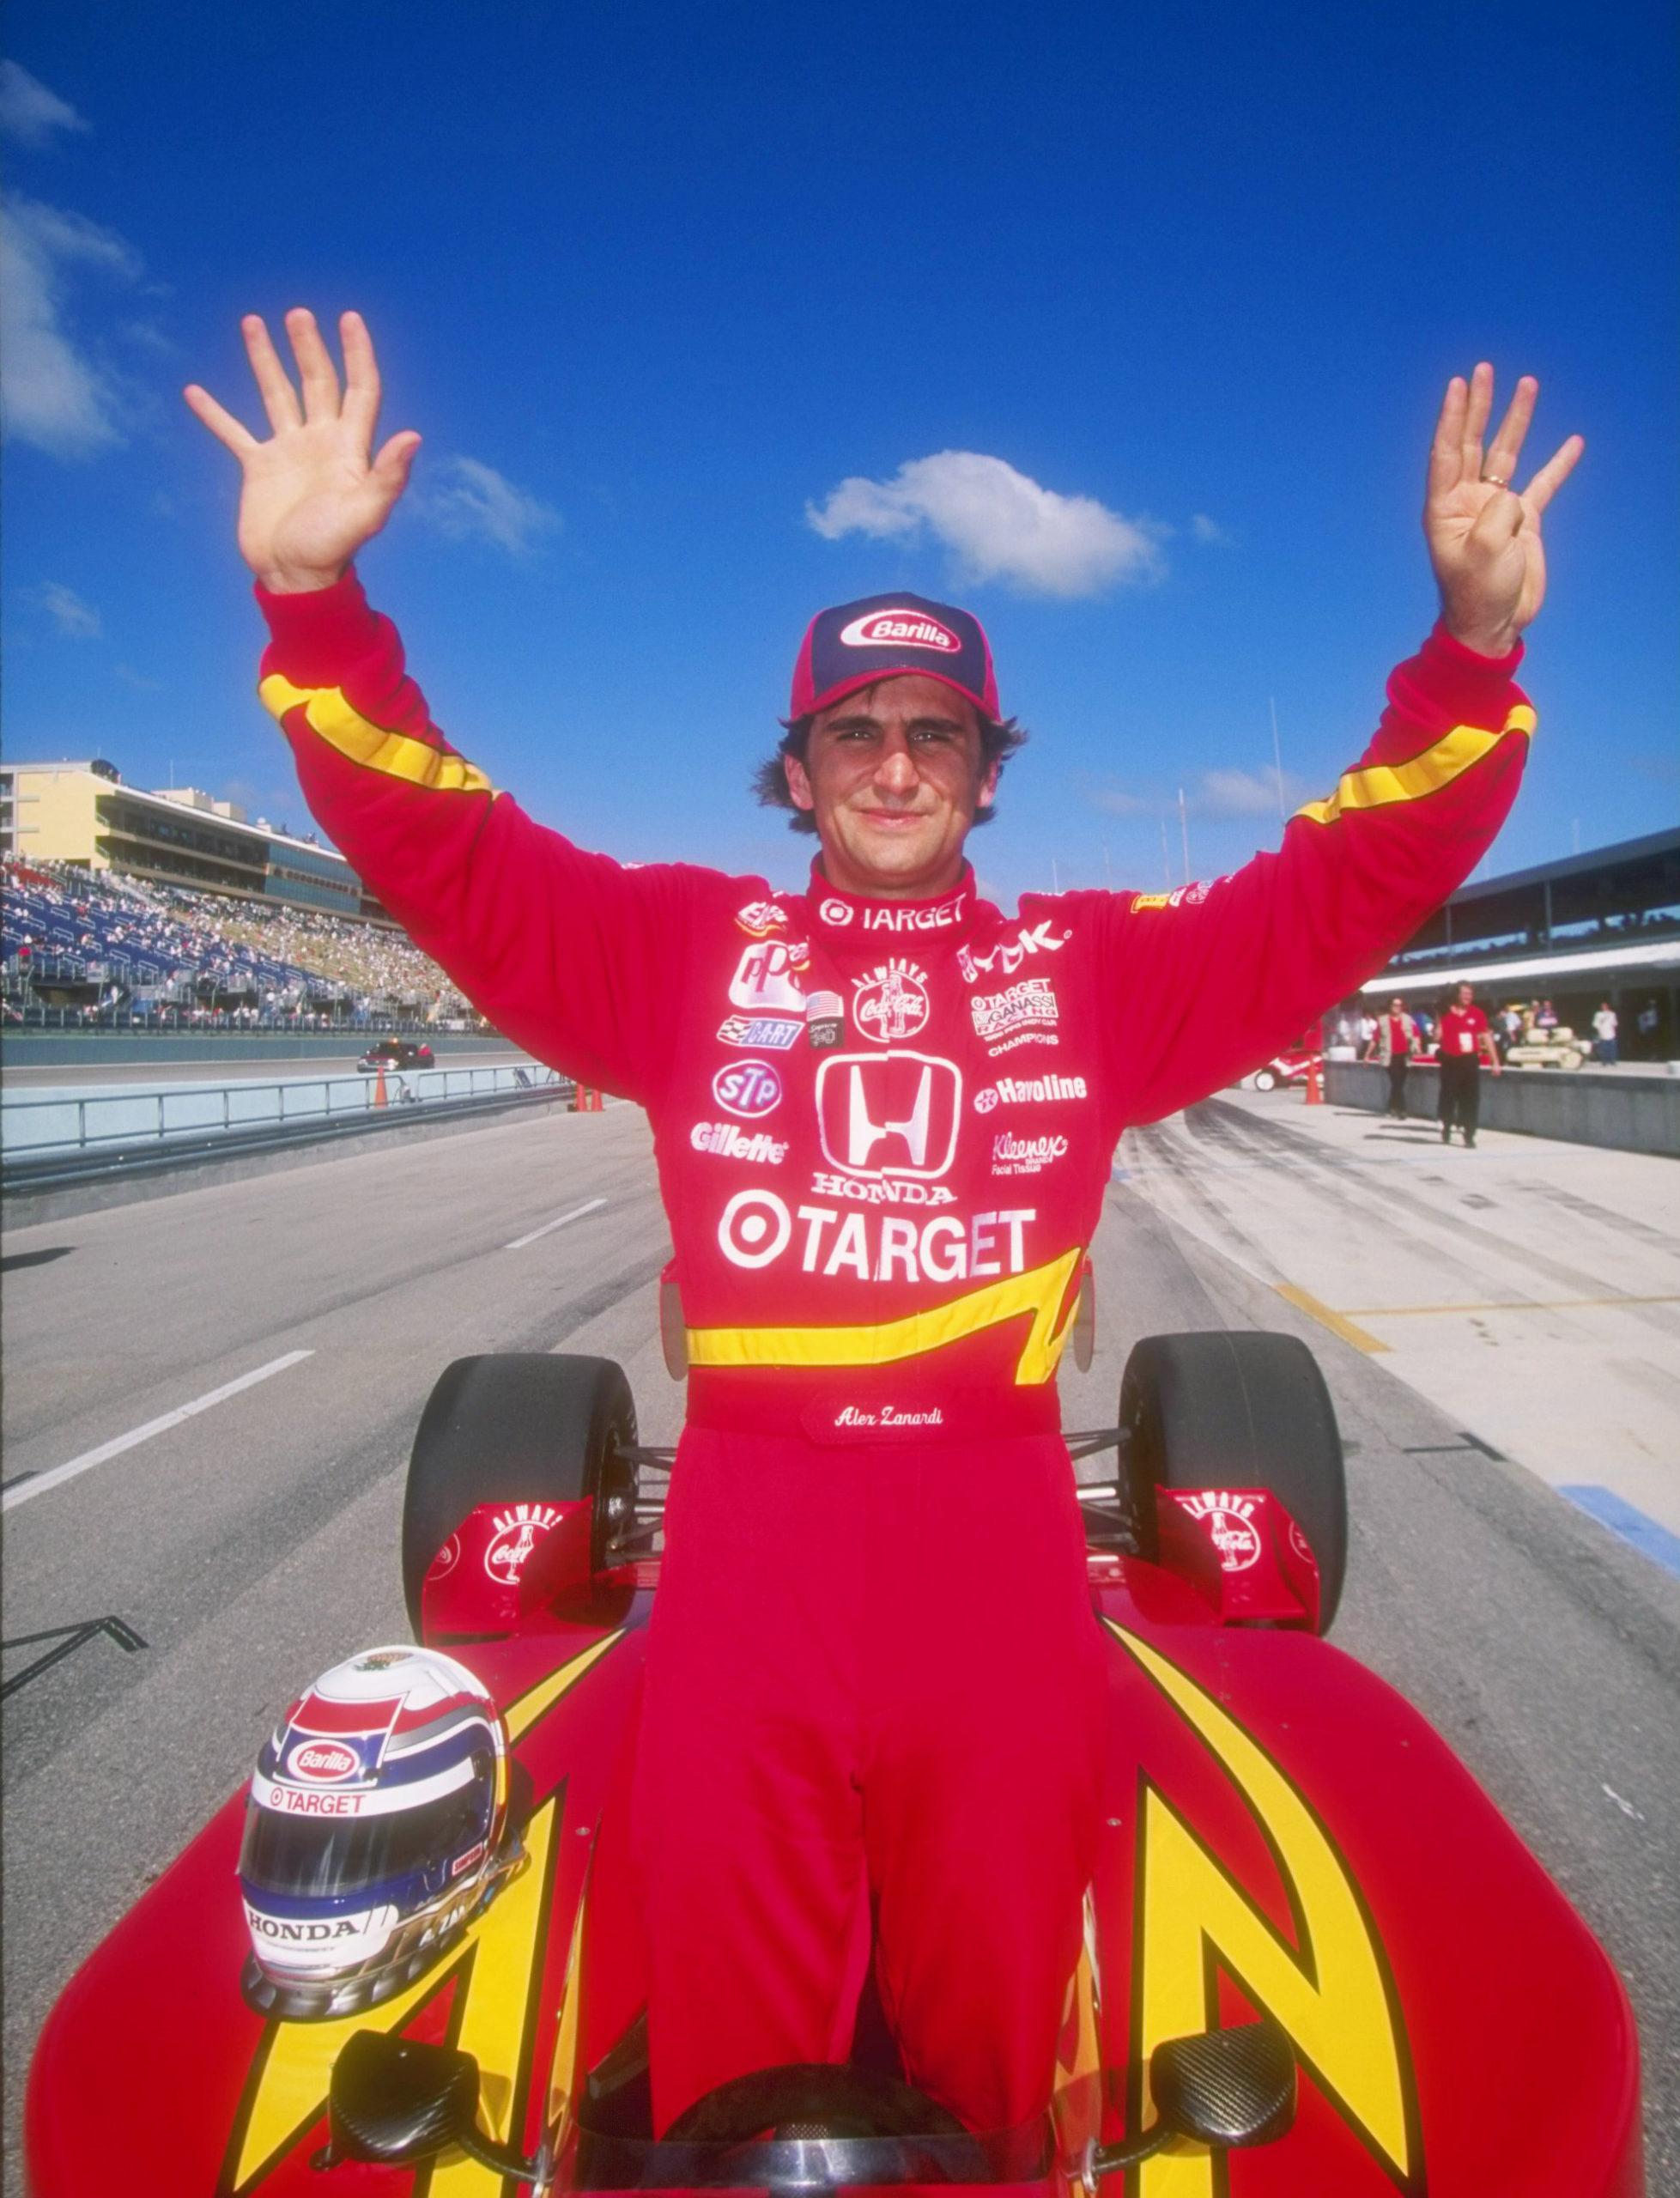 Alex Zanardi of Italy celebrates during the Marlboro Grand Prix in Homestead, Florida.